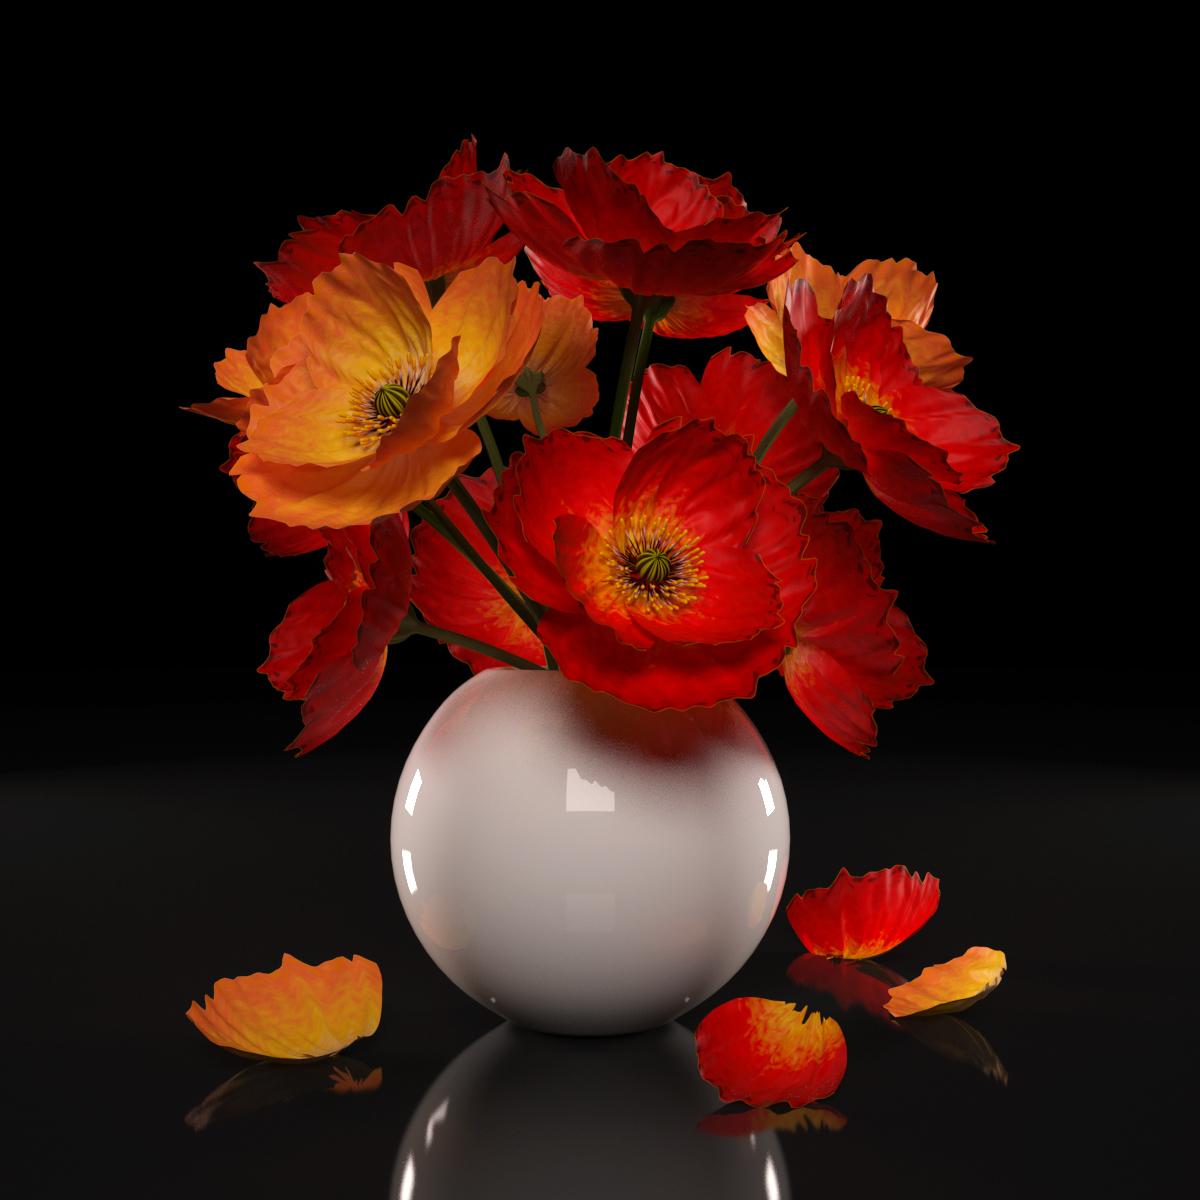 Red Poppies Flowers Model Turbosquid 1160325